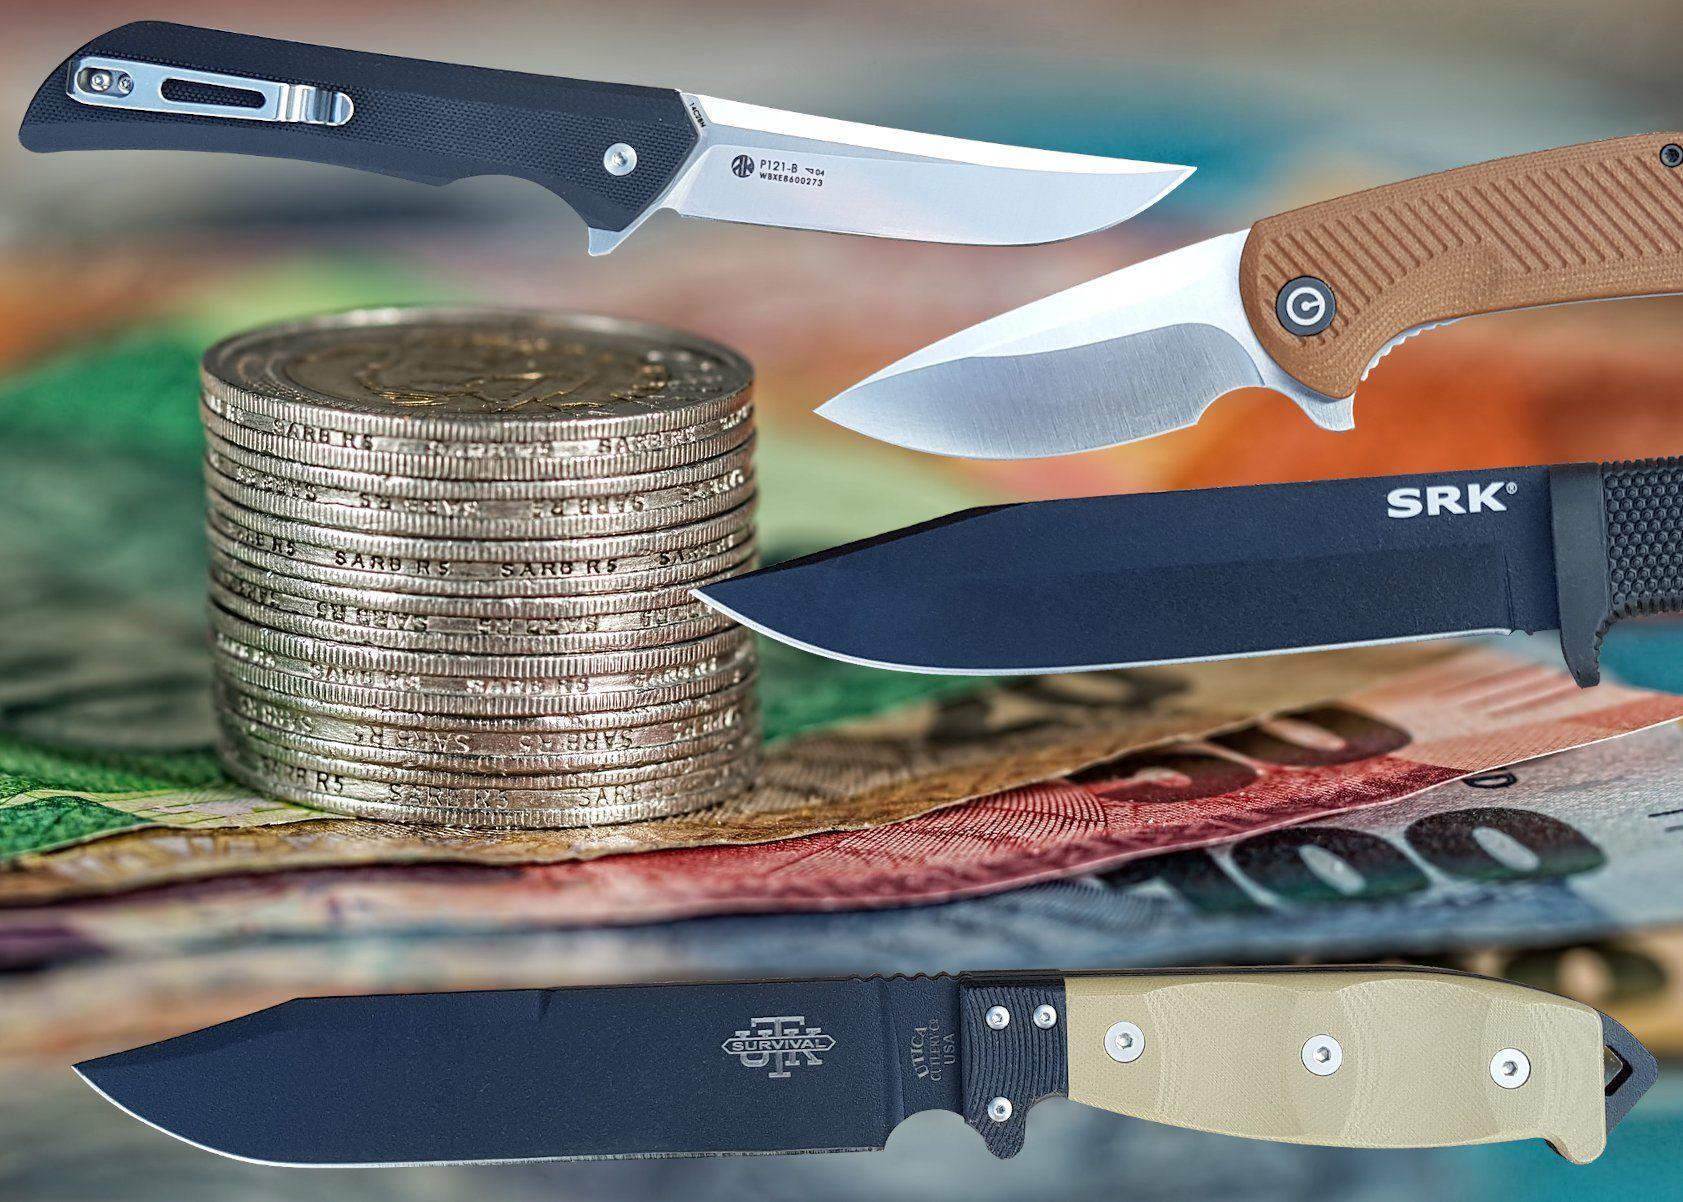 Messer Test 2019 - Budget Folder